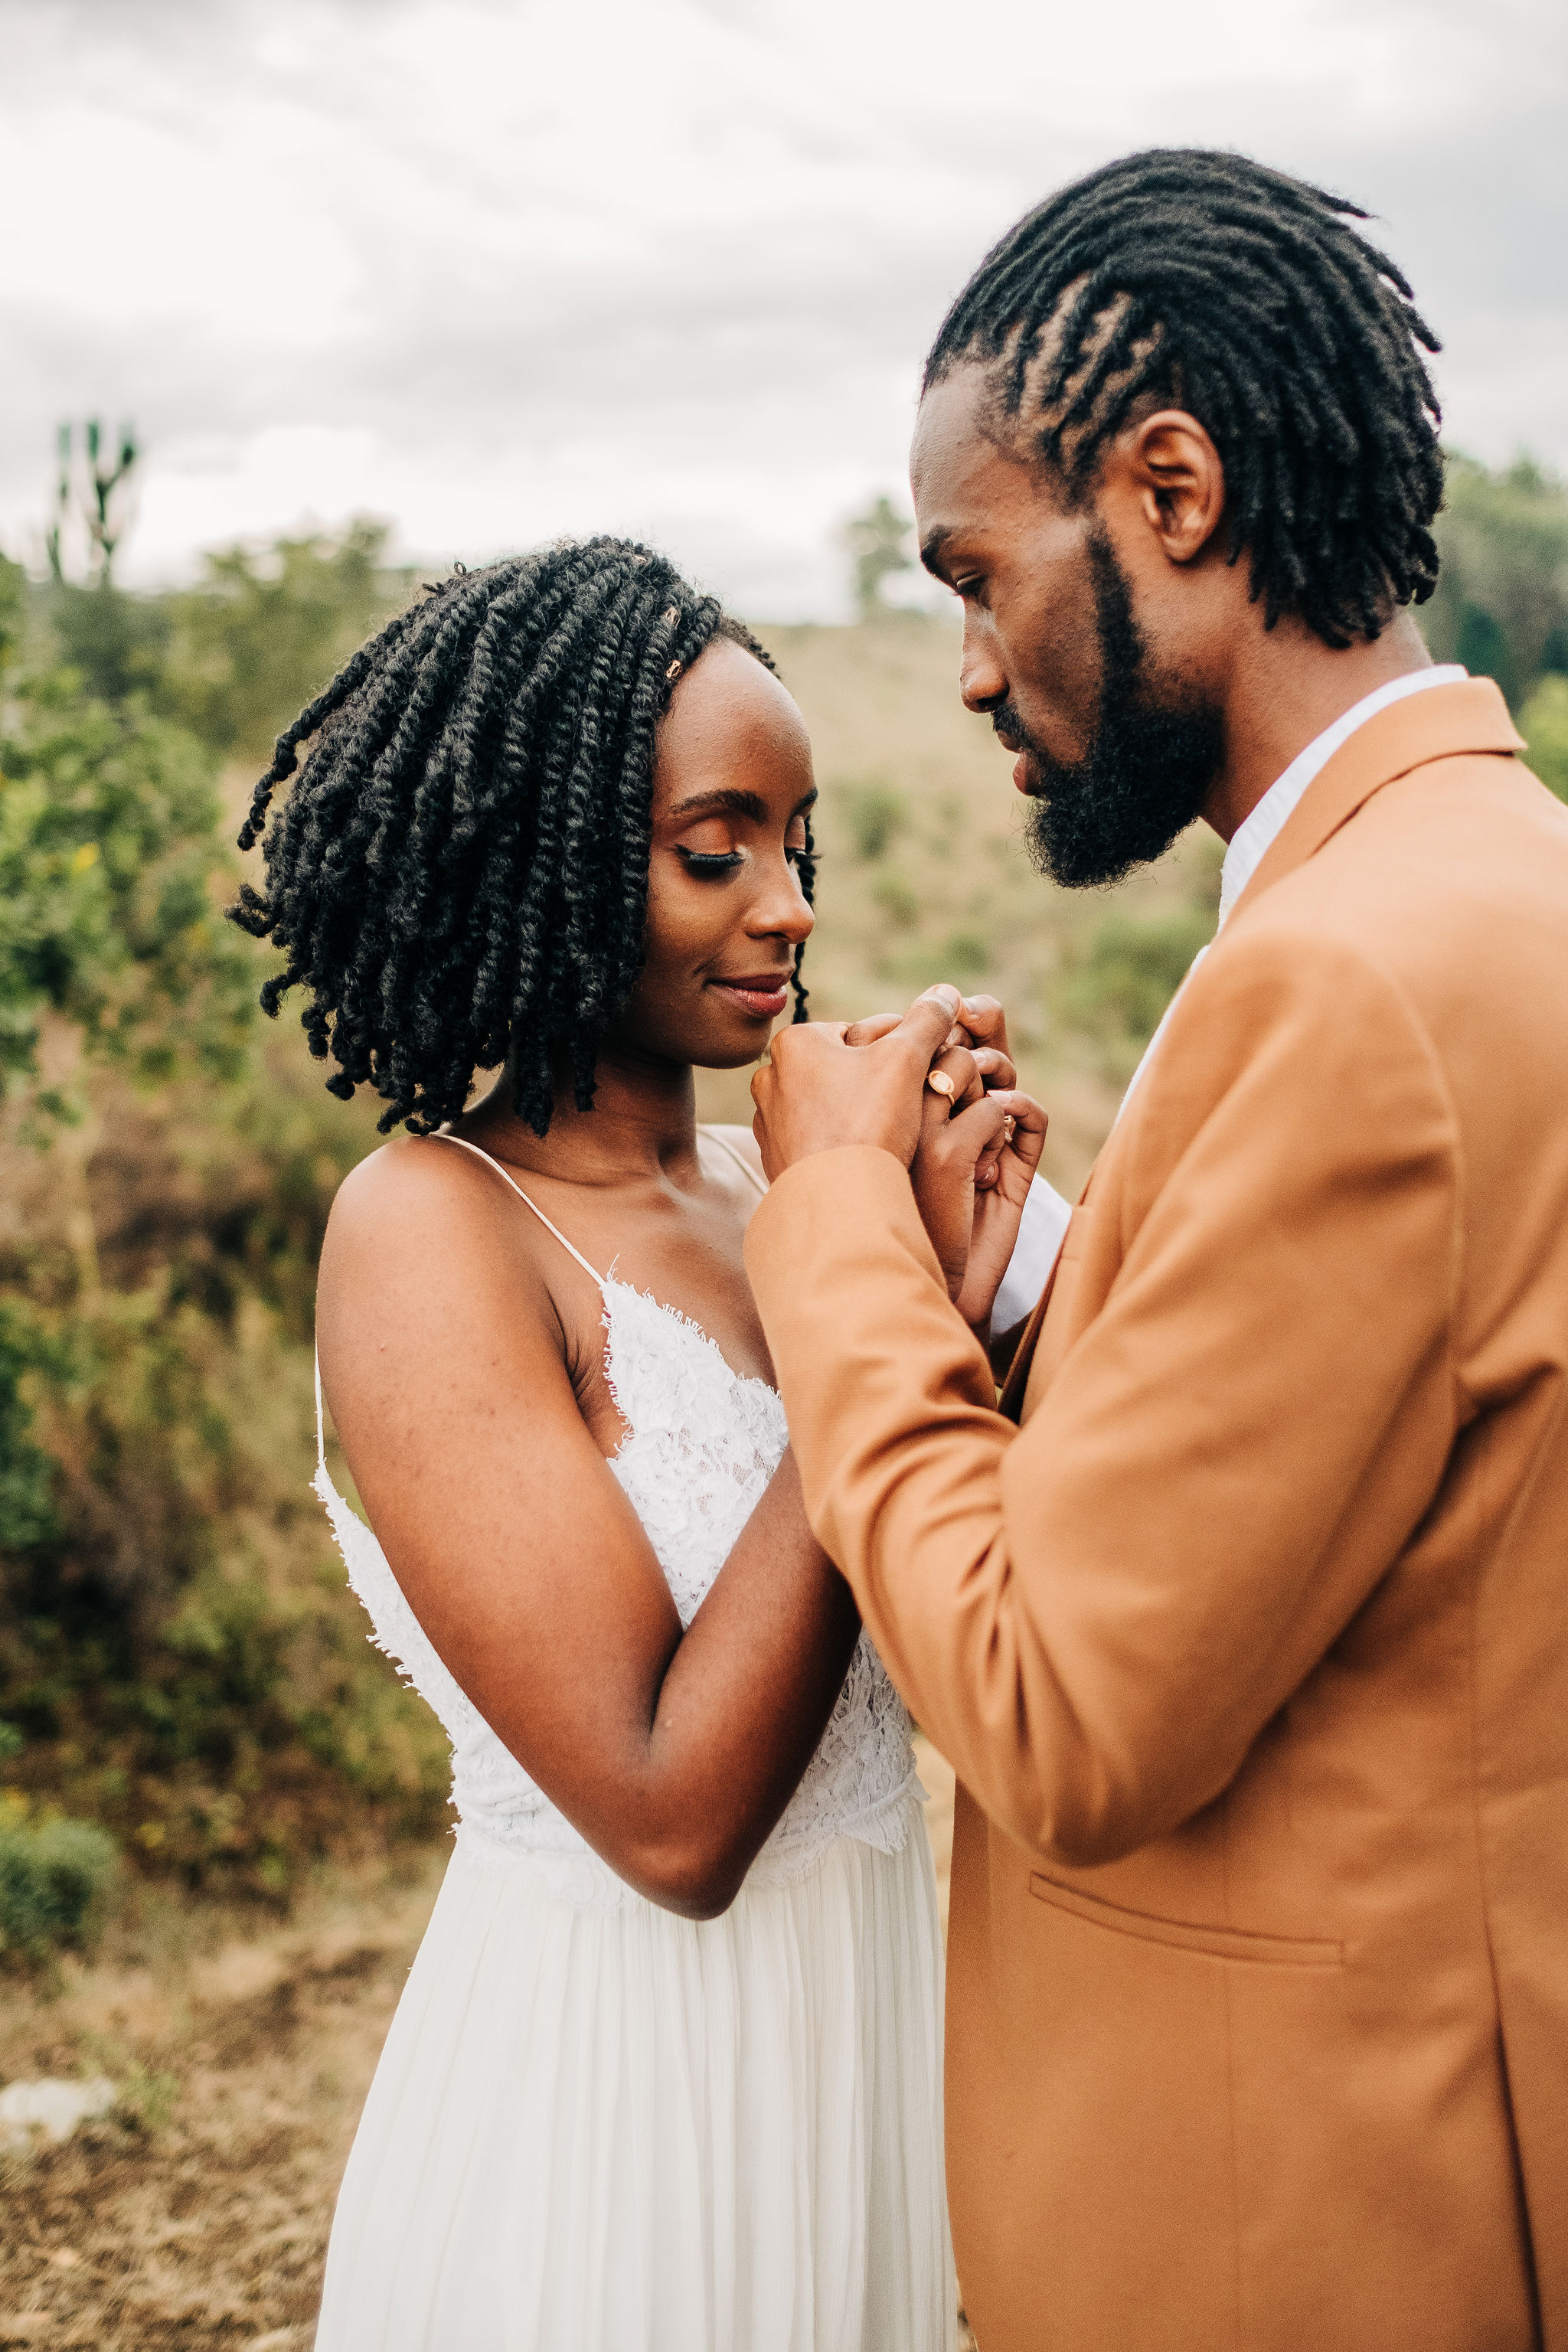 Anna-Hari-Photography-Destination-Wedding-Photographer-Kenya-173.jpg